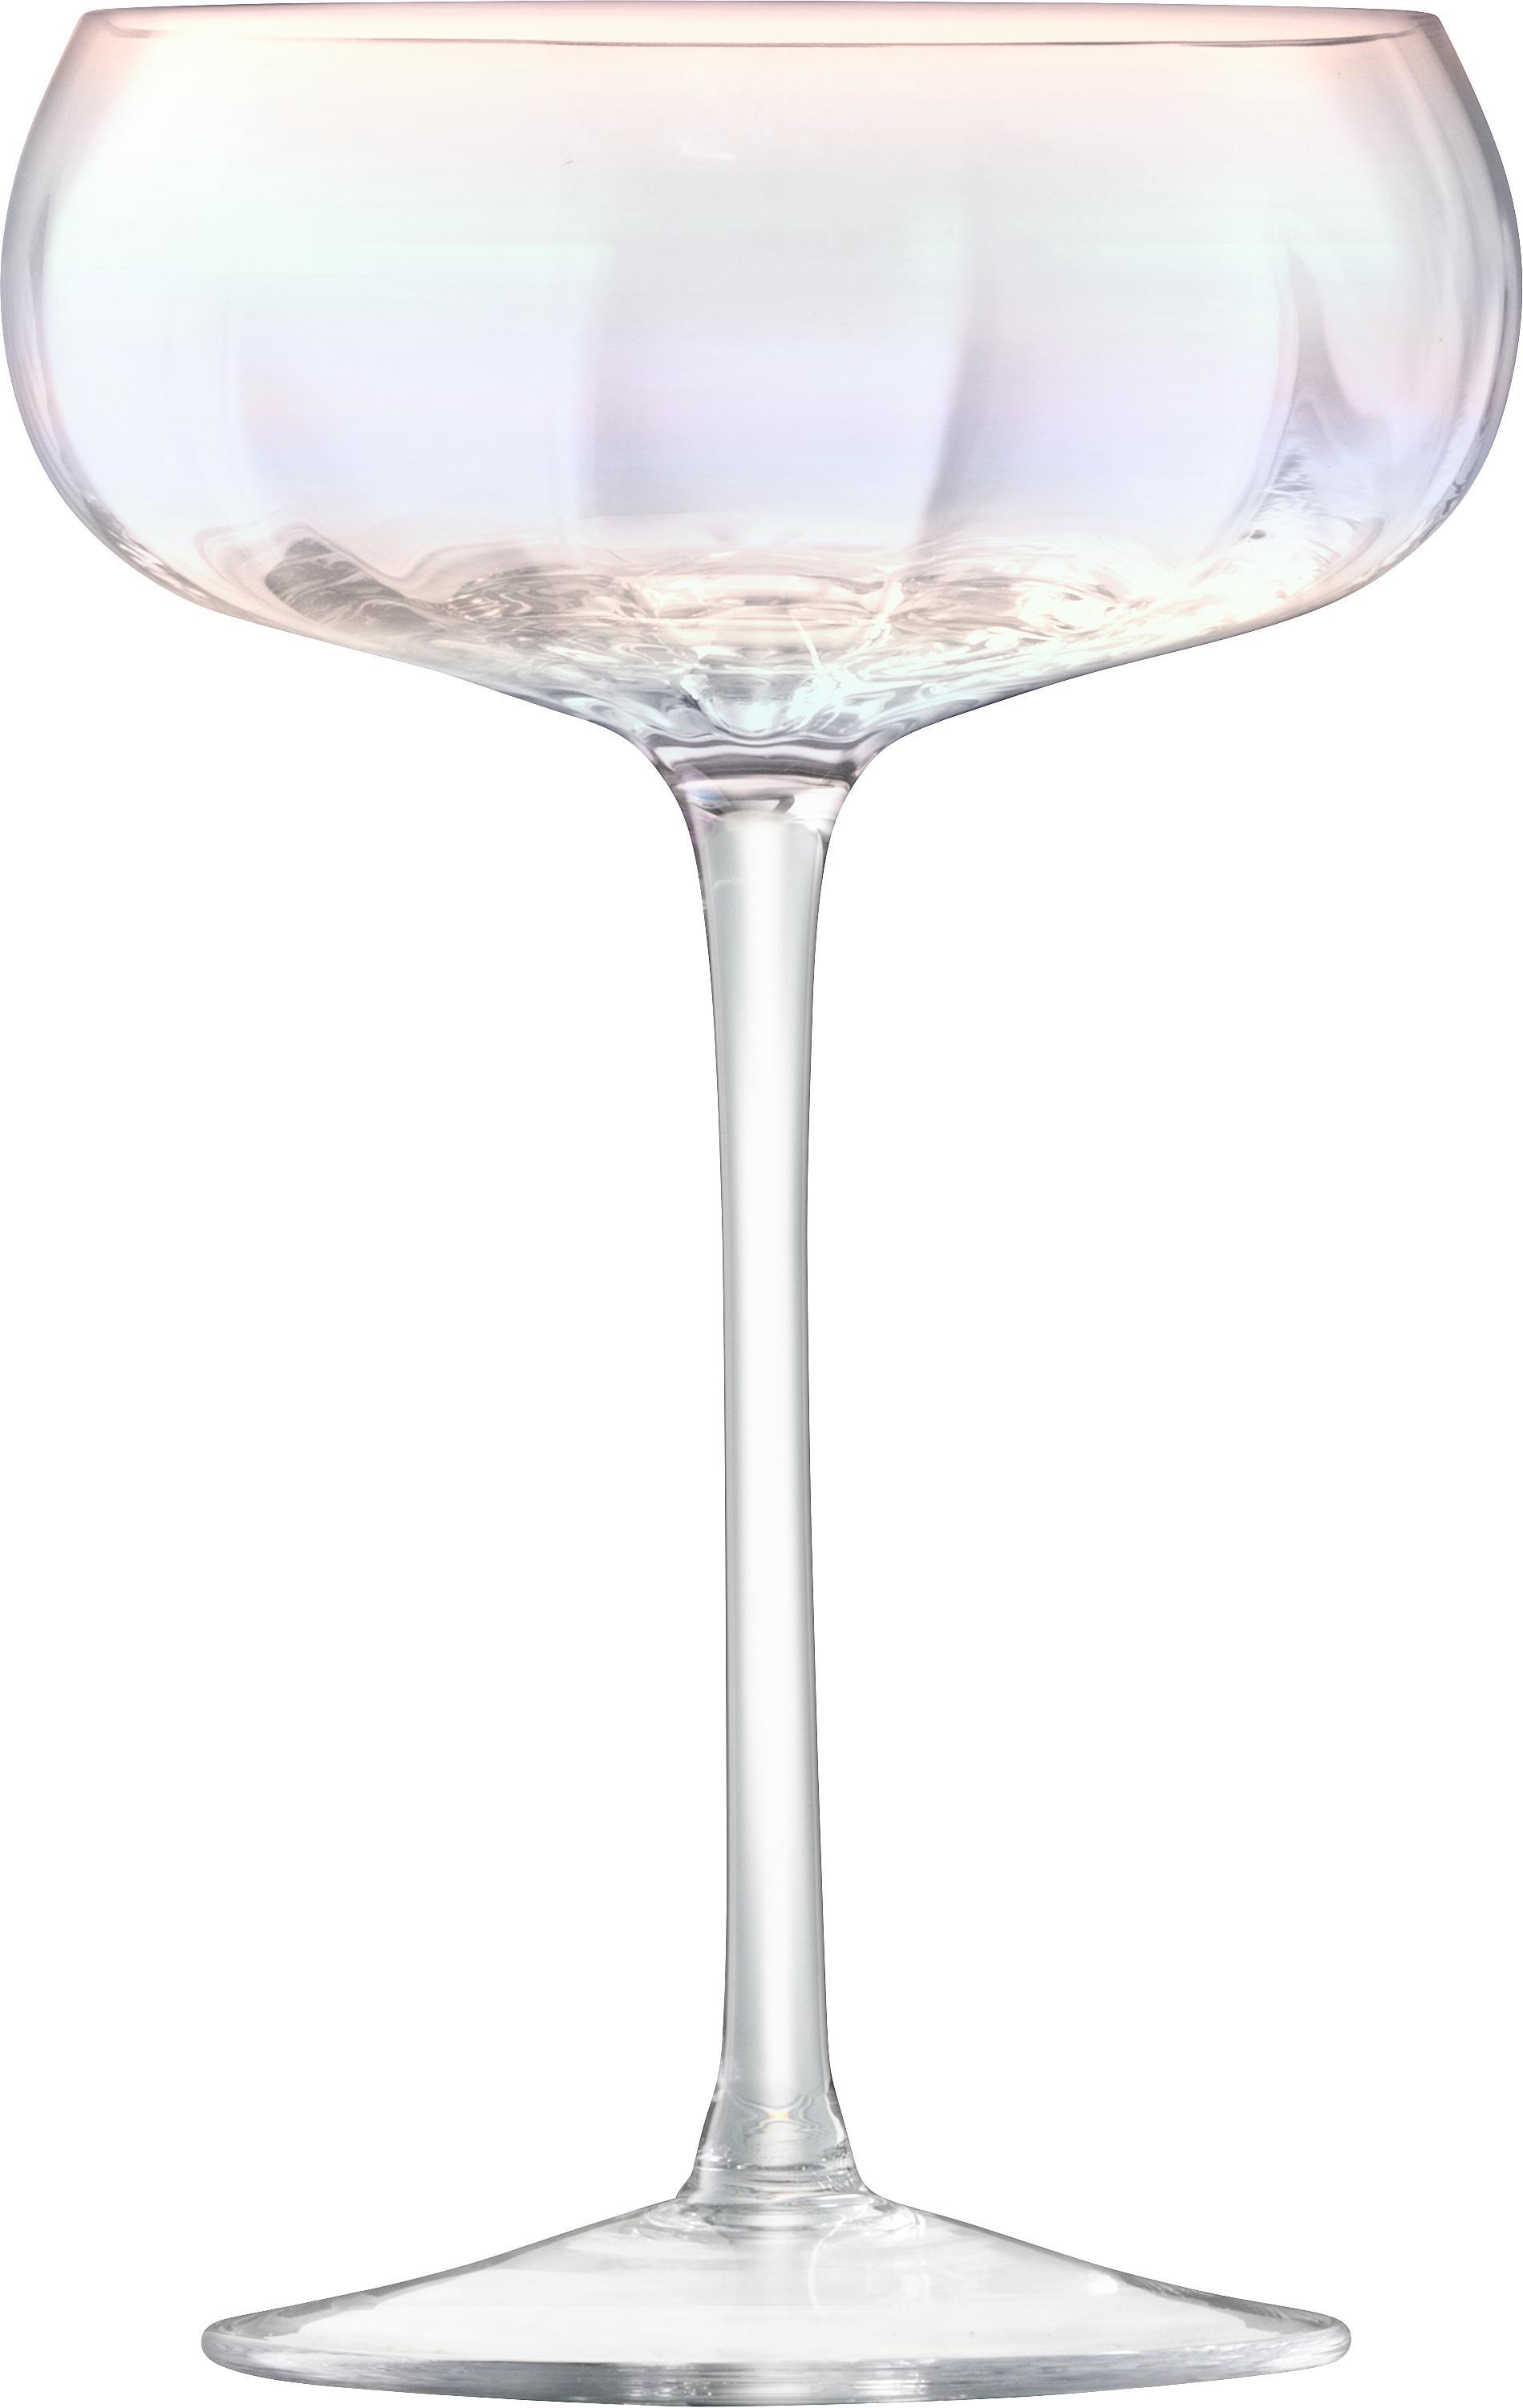 Mondgeblazen champagneglazen Pearl met paarlemoer glans, 4-delig, Glas, Parelmoerglans, Ø 11 x H 16 cm